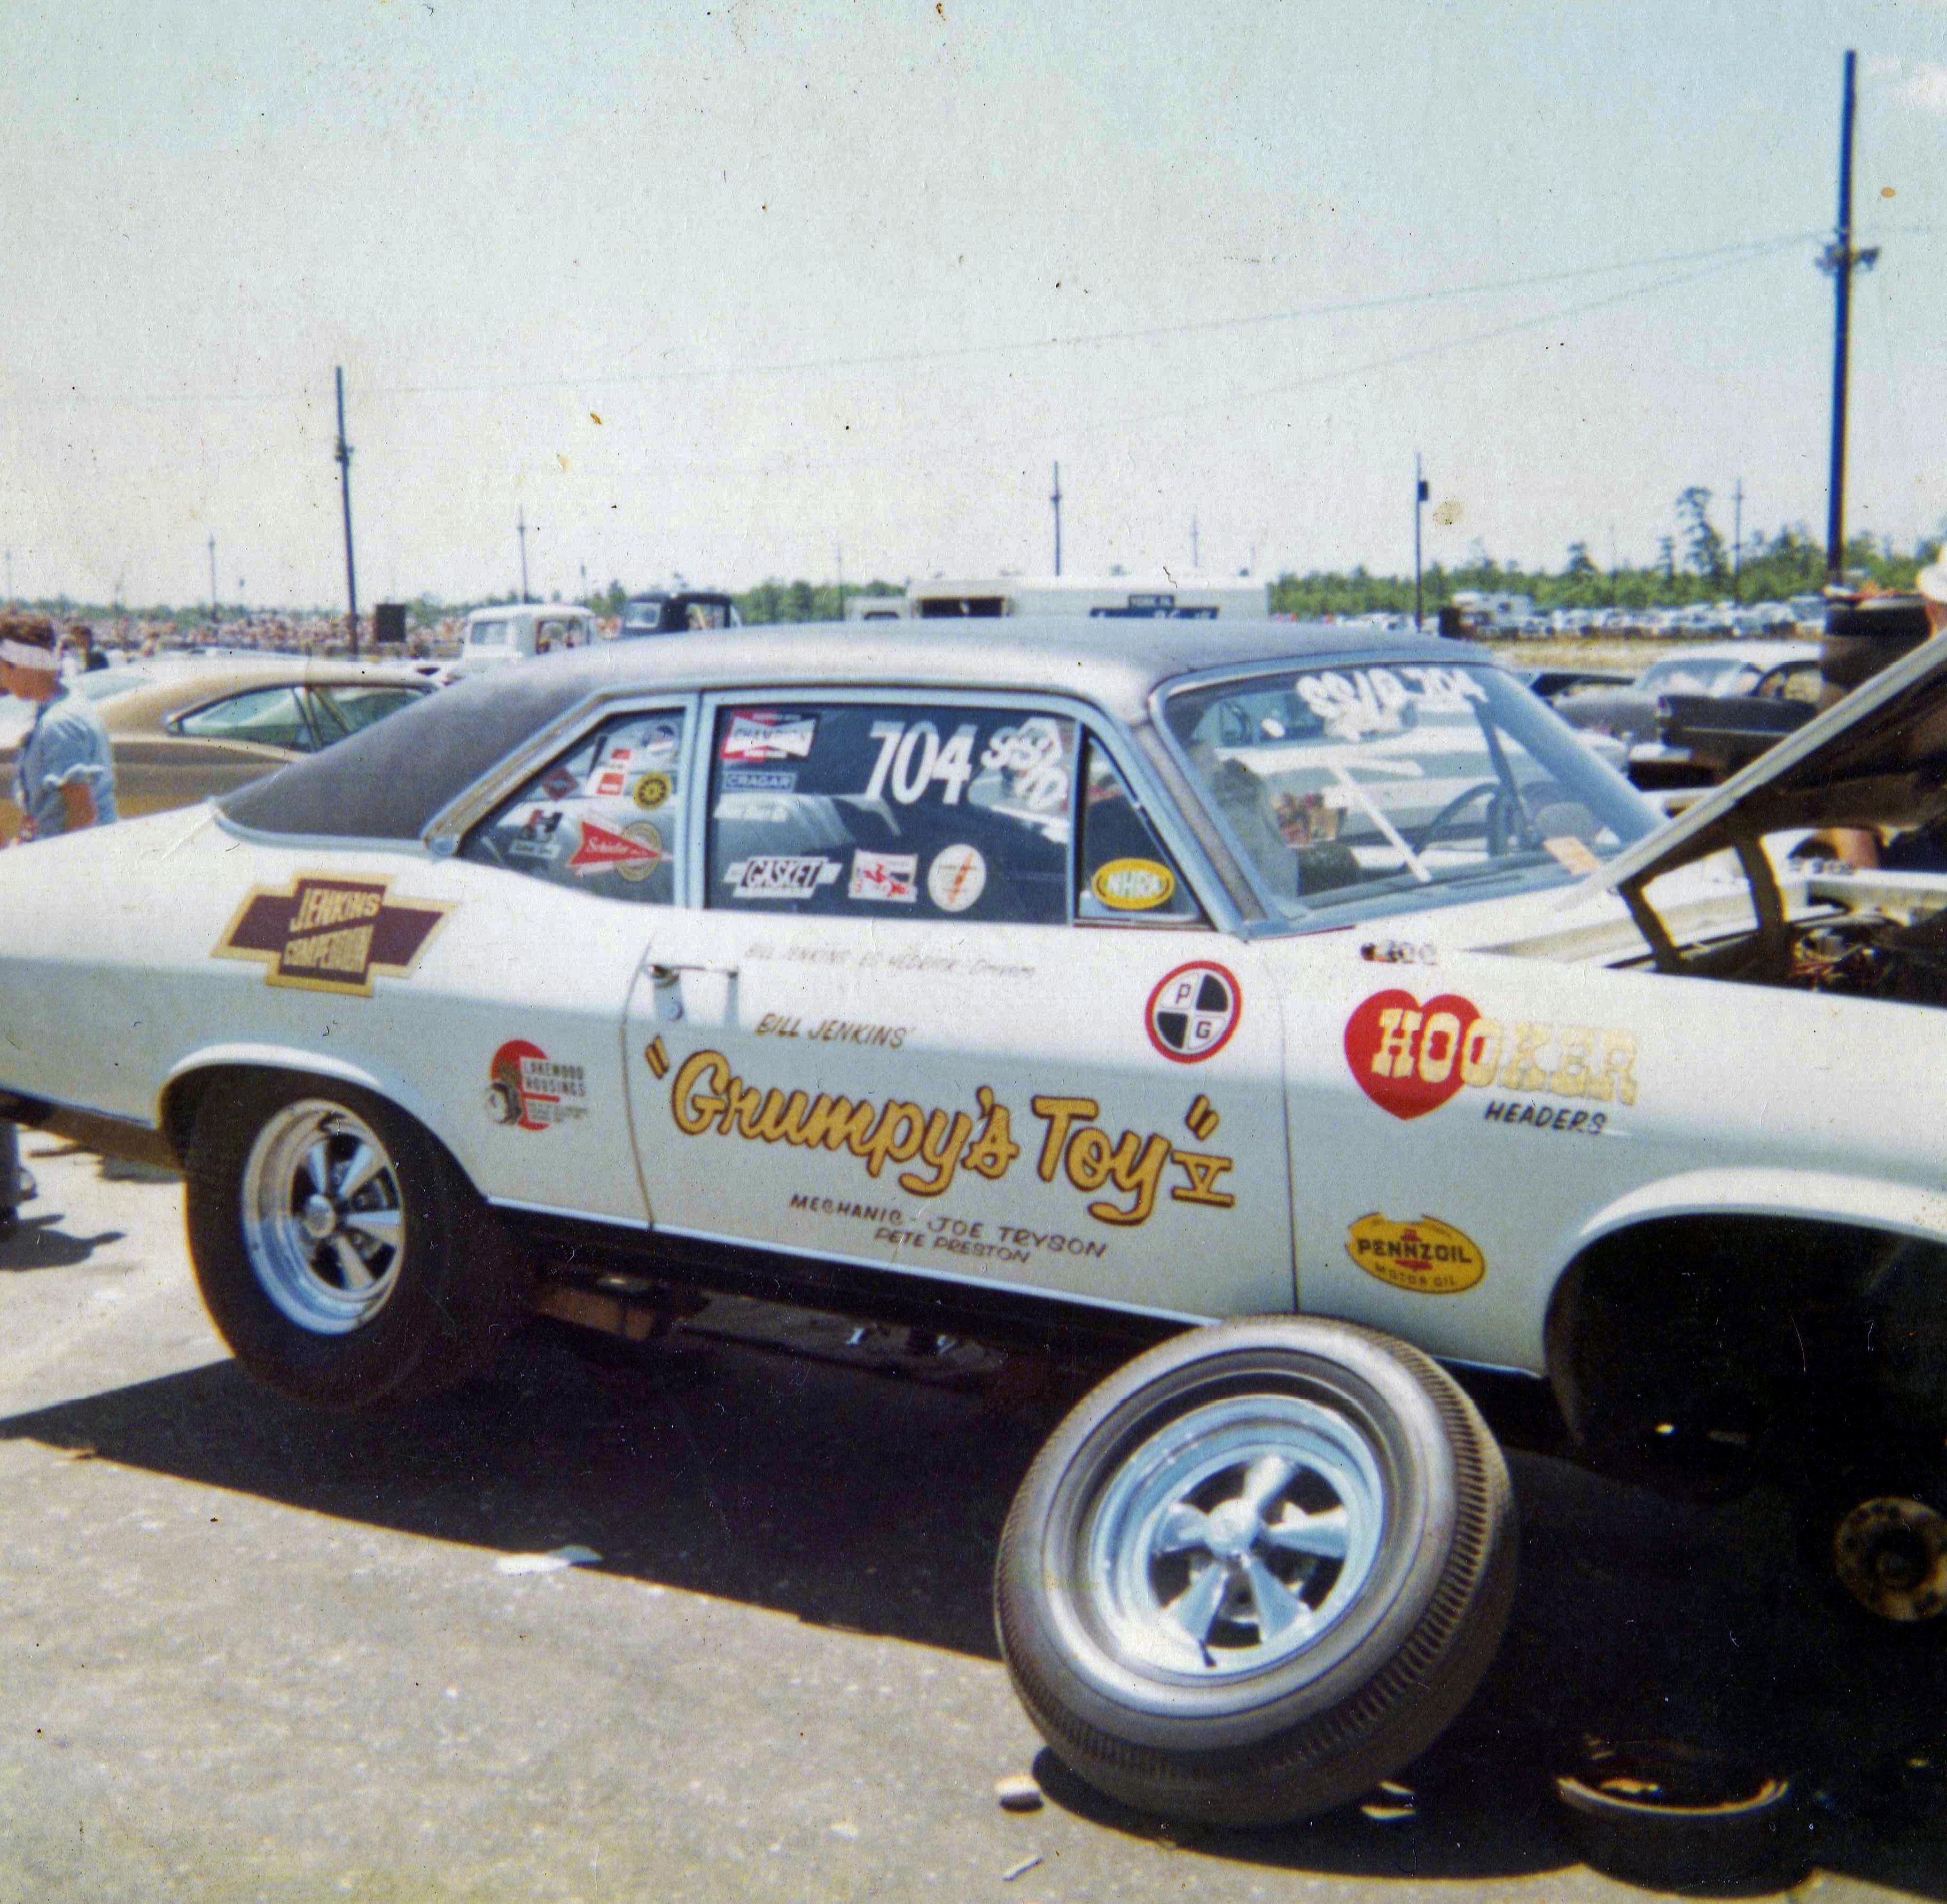 Bill Jenkins Grumpy S Toy V 1968 Nova Chevy Message Forum Restoration And Repair Help